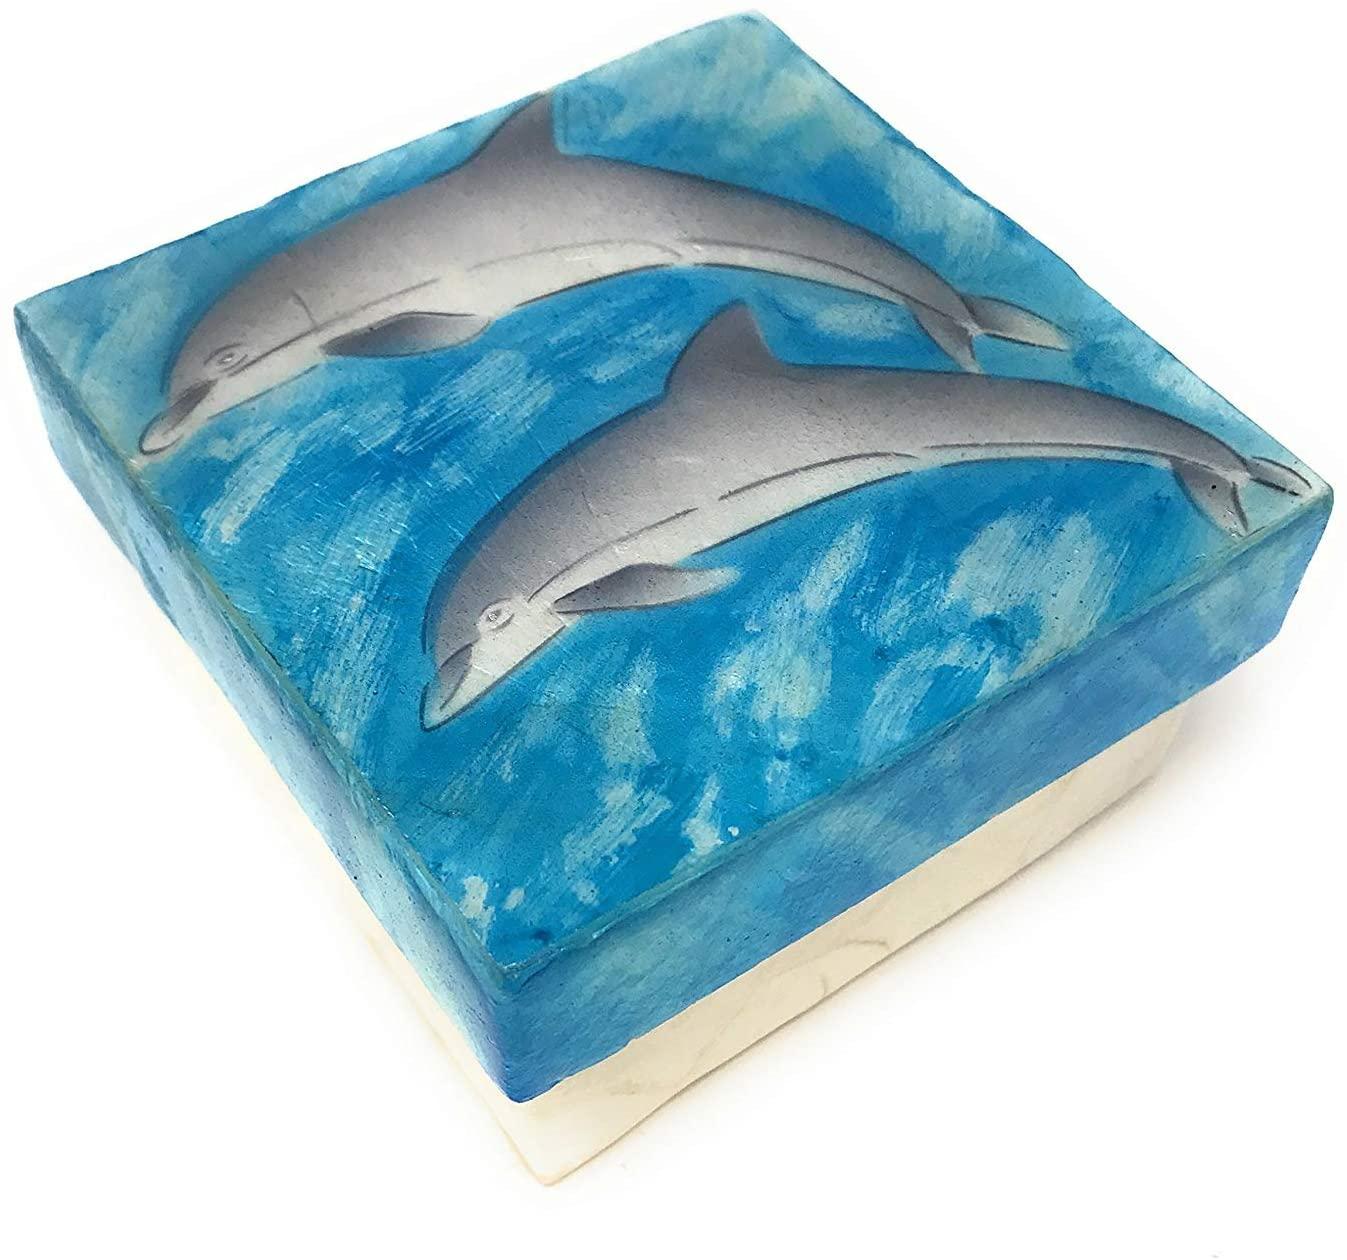 Kubla Craft Capiz Shell Pair of Dolphins Keepsake Box, 3 Inches Square